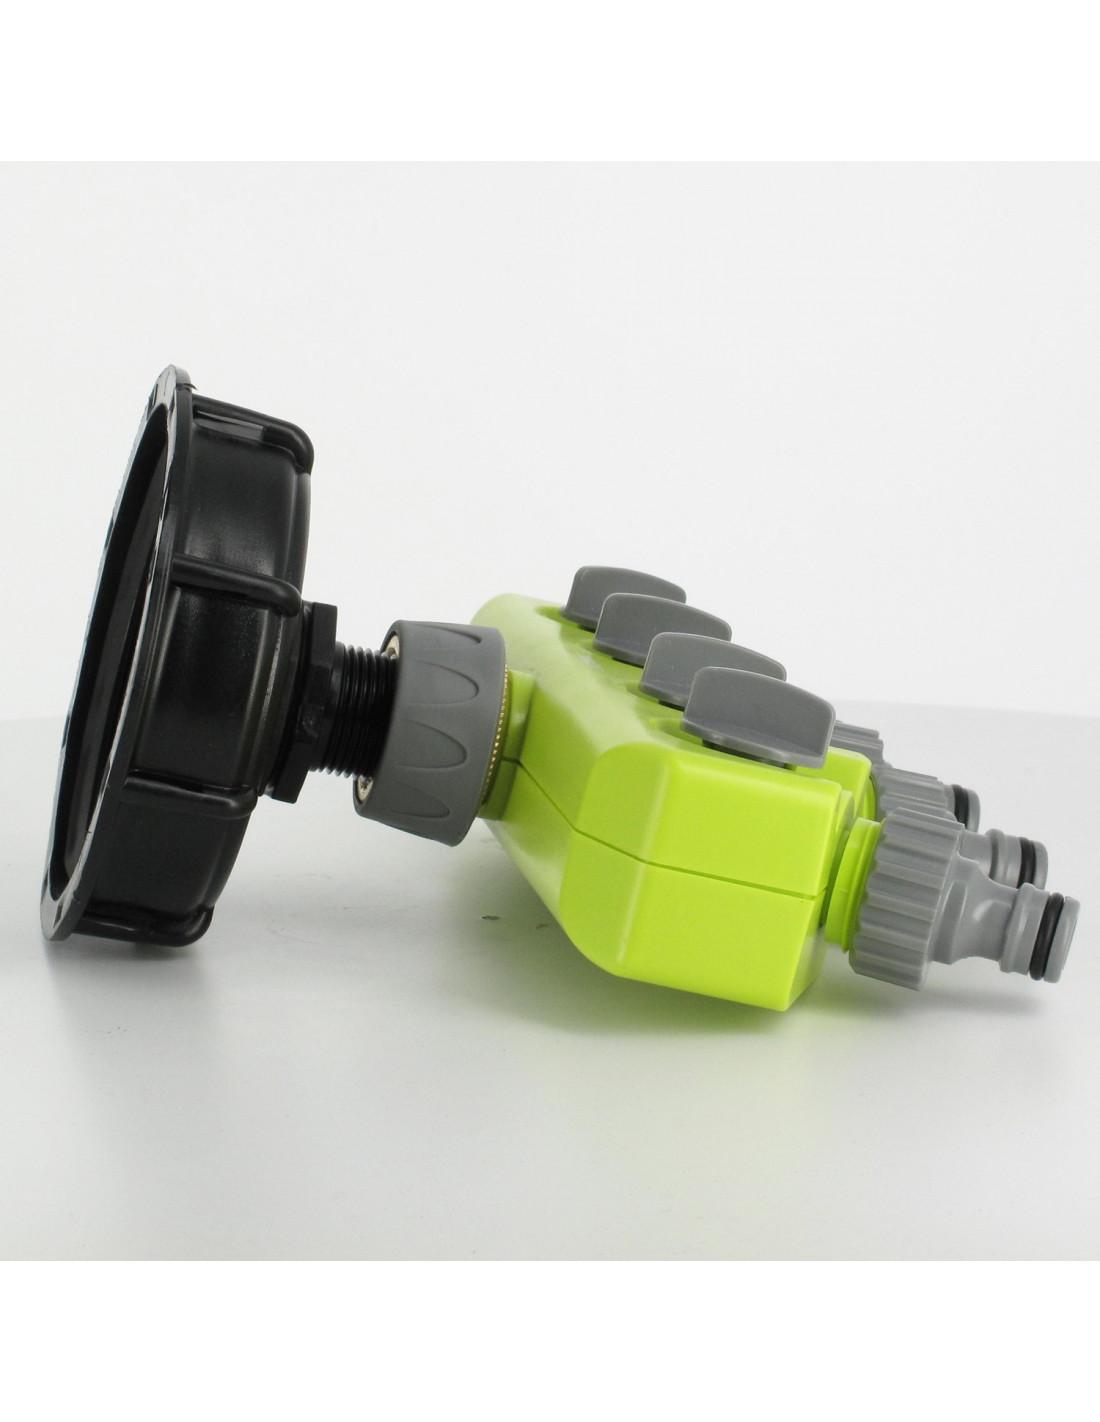 raccord s100x8 cuve eau 4 robinets avec nez type gardena. Black Bedroom Furniture Sets. Home Design Ideas